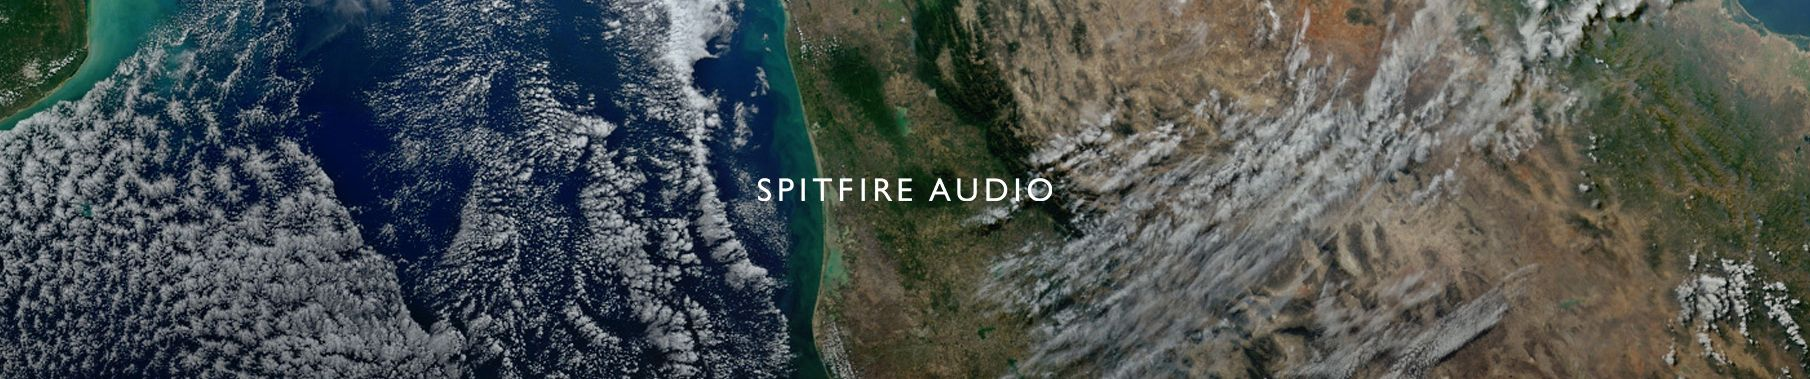 SPITFIRE AUDIO | Free Listening on SoundCloud